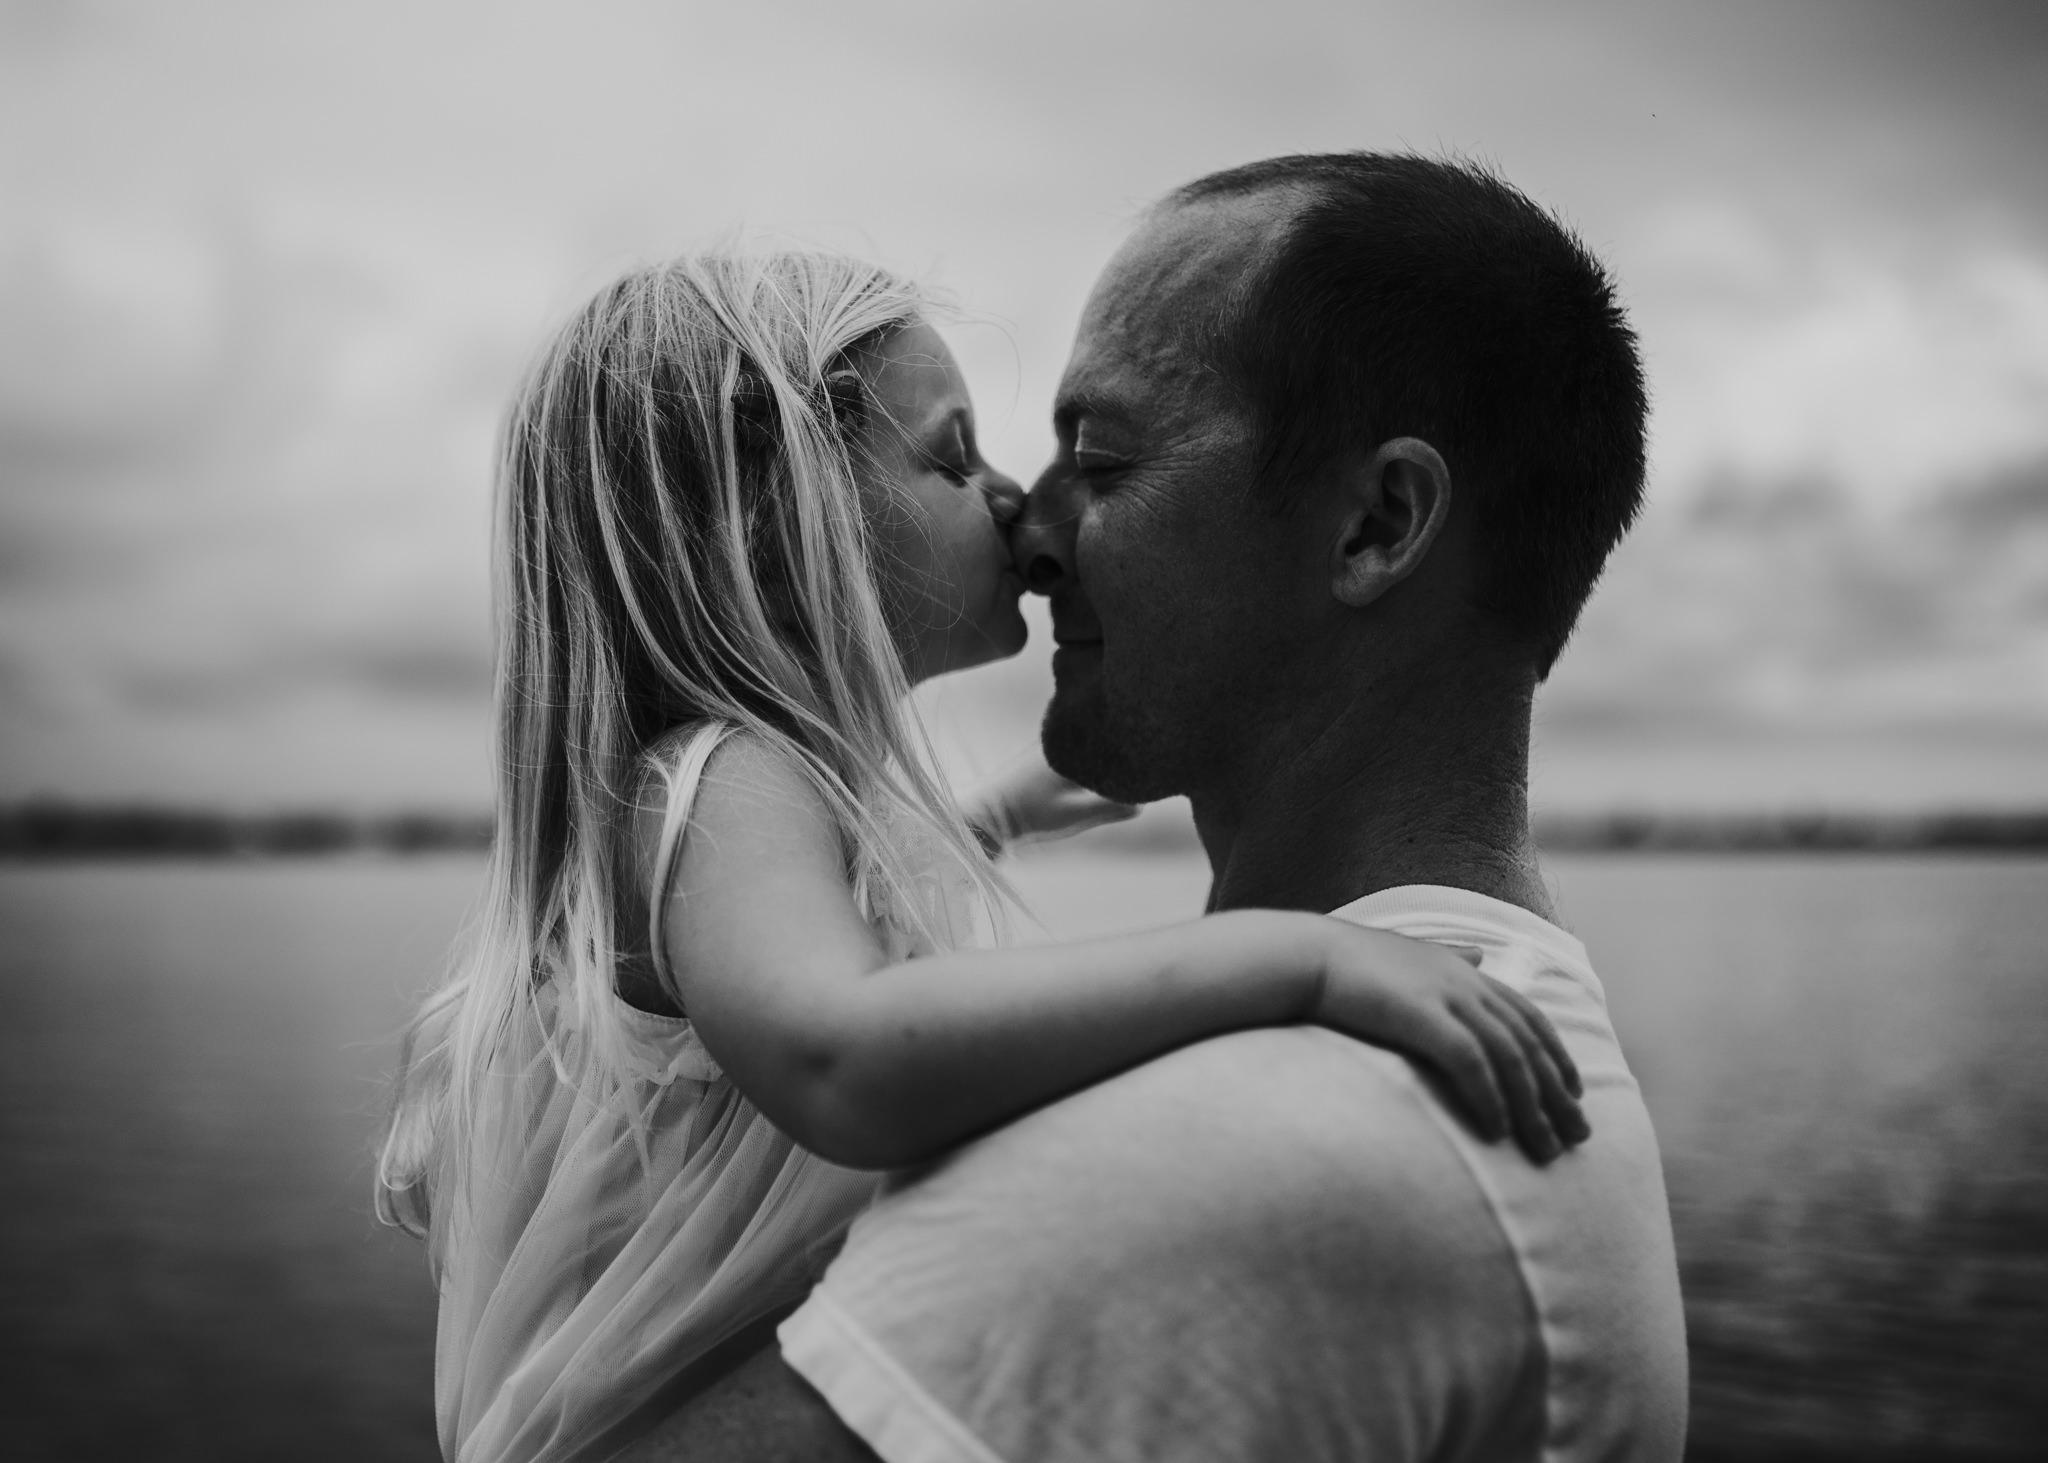 twyla jones photography - treasure coast florida - island family session-5108.jpg